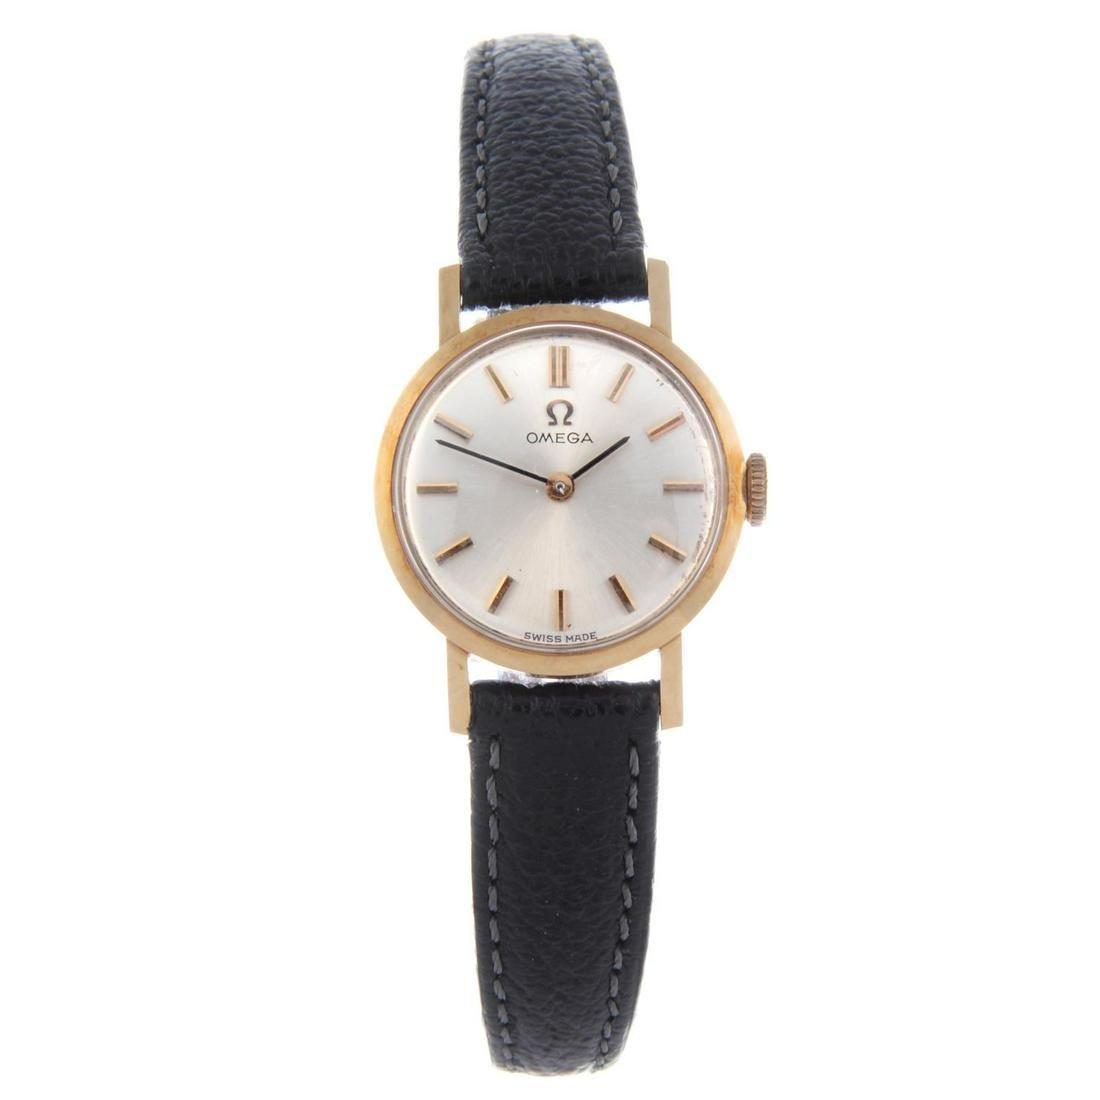 OMEGA - a lady's wrist watch. Yellow metal case,